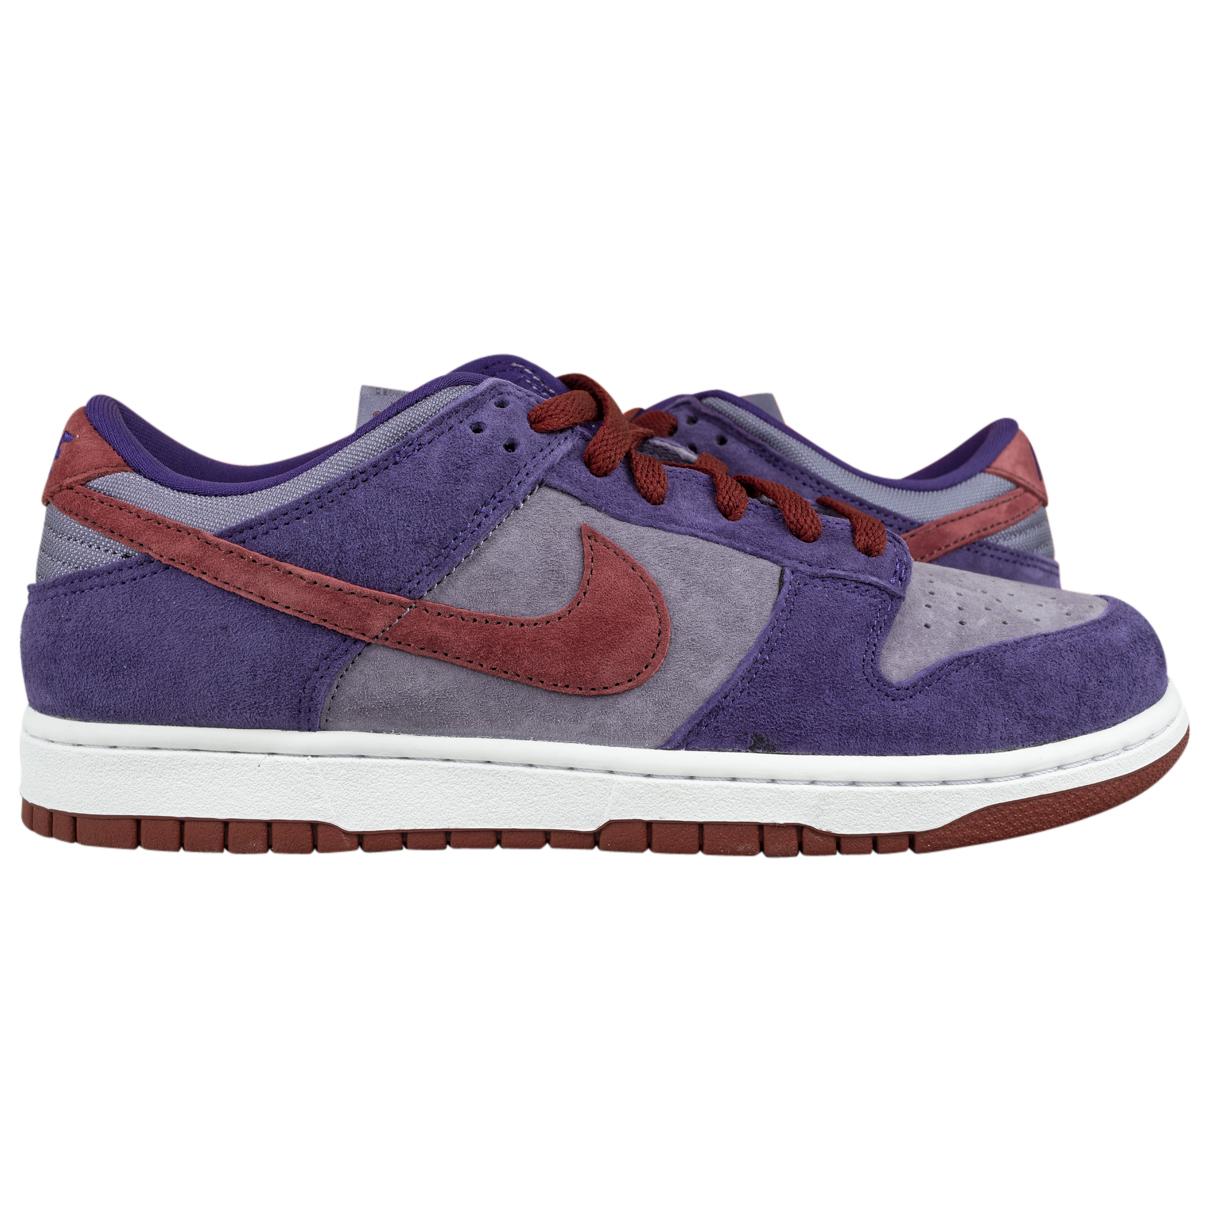 Nike - Baskets SB Dunk  pour homme en suede - violet